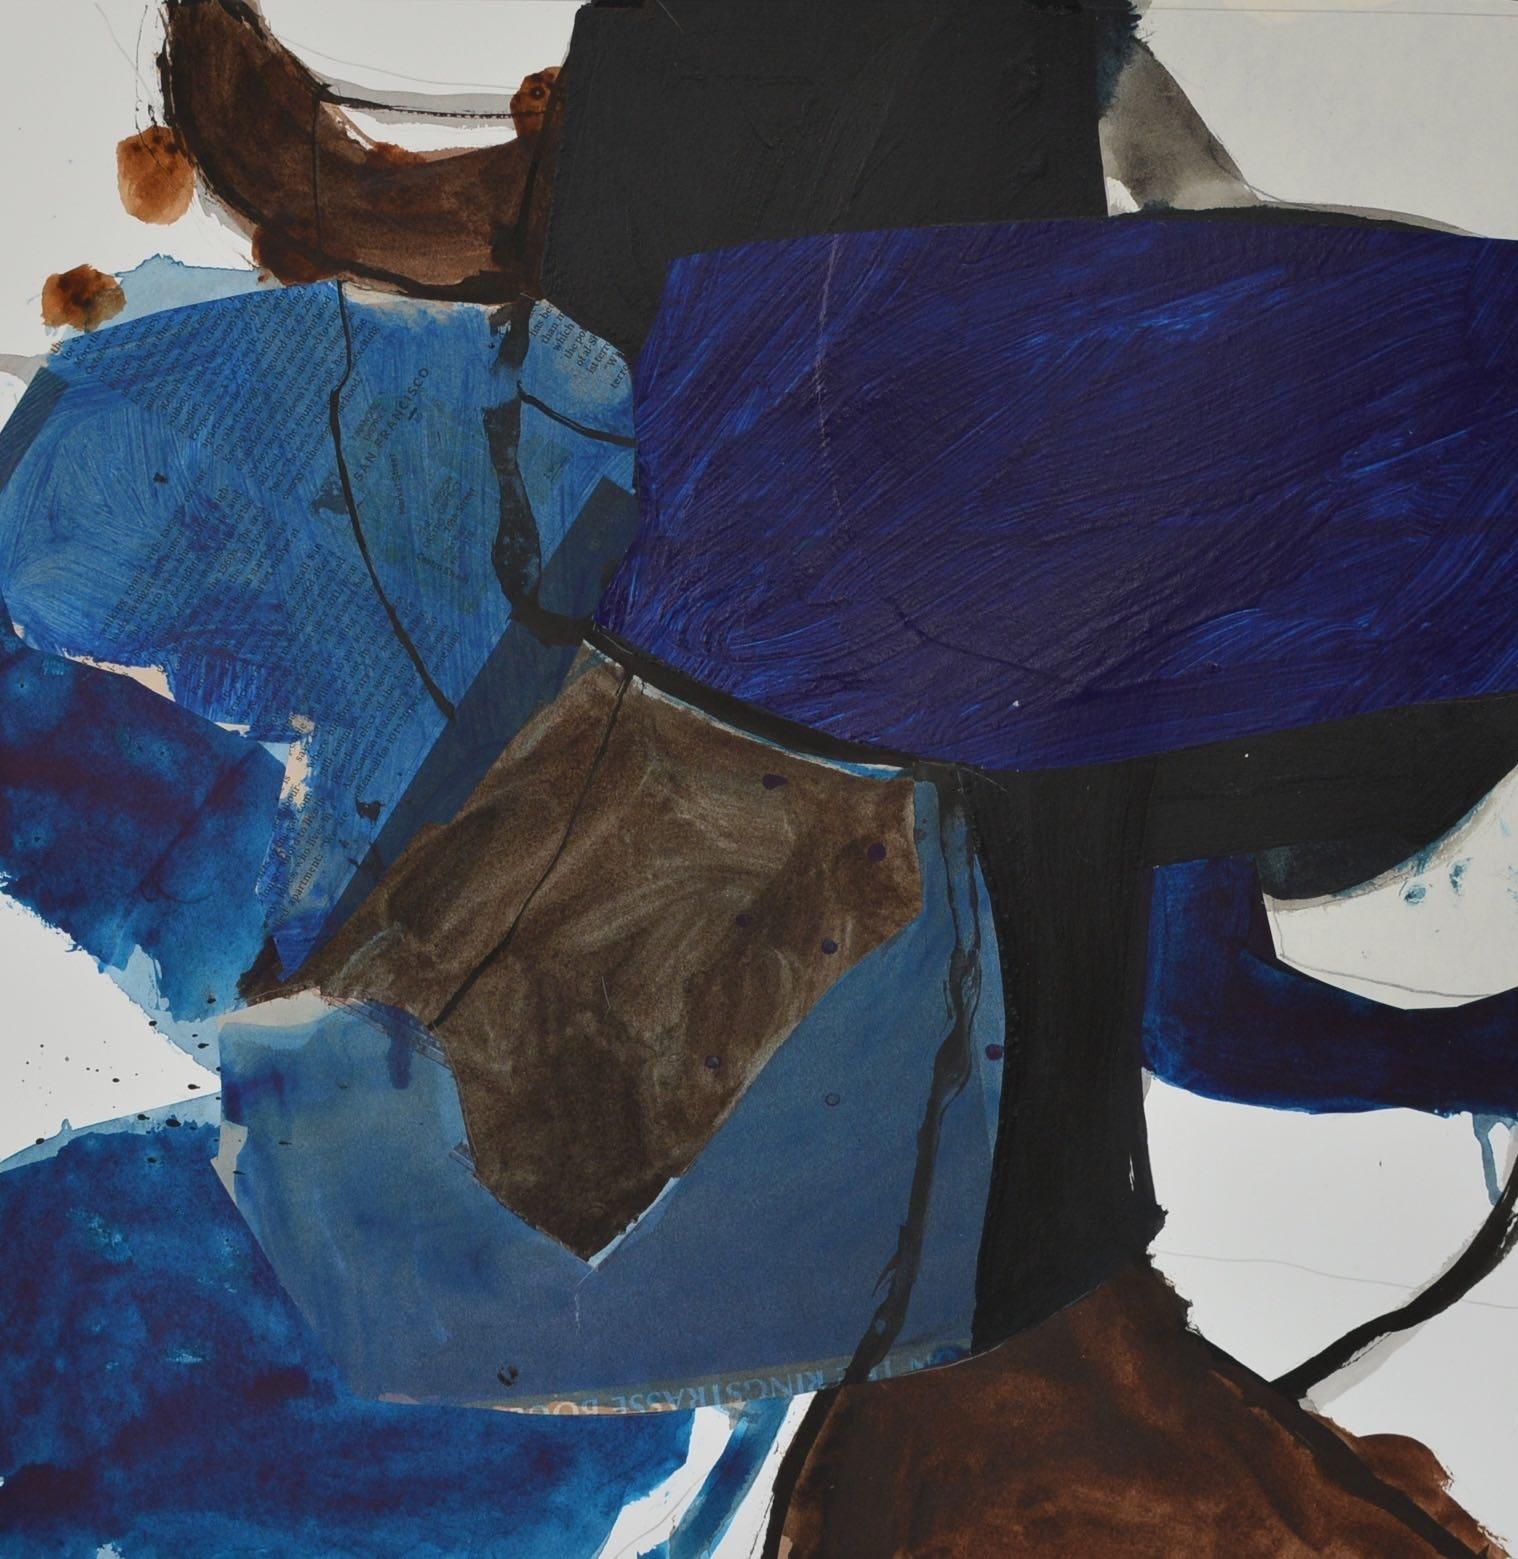 <span class=&#34;link fancybox-details-link&#34;><a href=&#34;/exhibitions/24/works/artworks_standalone10717/&#34;>View Detail Page</a></span><div class=&#34;artist&#34;><span class=&#34;artist&#34;><strong>Jim Hunter</strong></span></div><div class=&#34;title&#34;><em>St Aldhelm Tracks</em></div><div class=&#34;medium&#34;>watercolour, acrylic, ink & pasted paper</div><div class=&#34;dimensions&#34;>60 x 60cm</div>